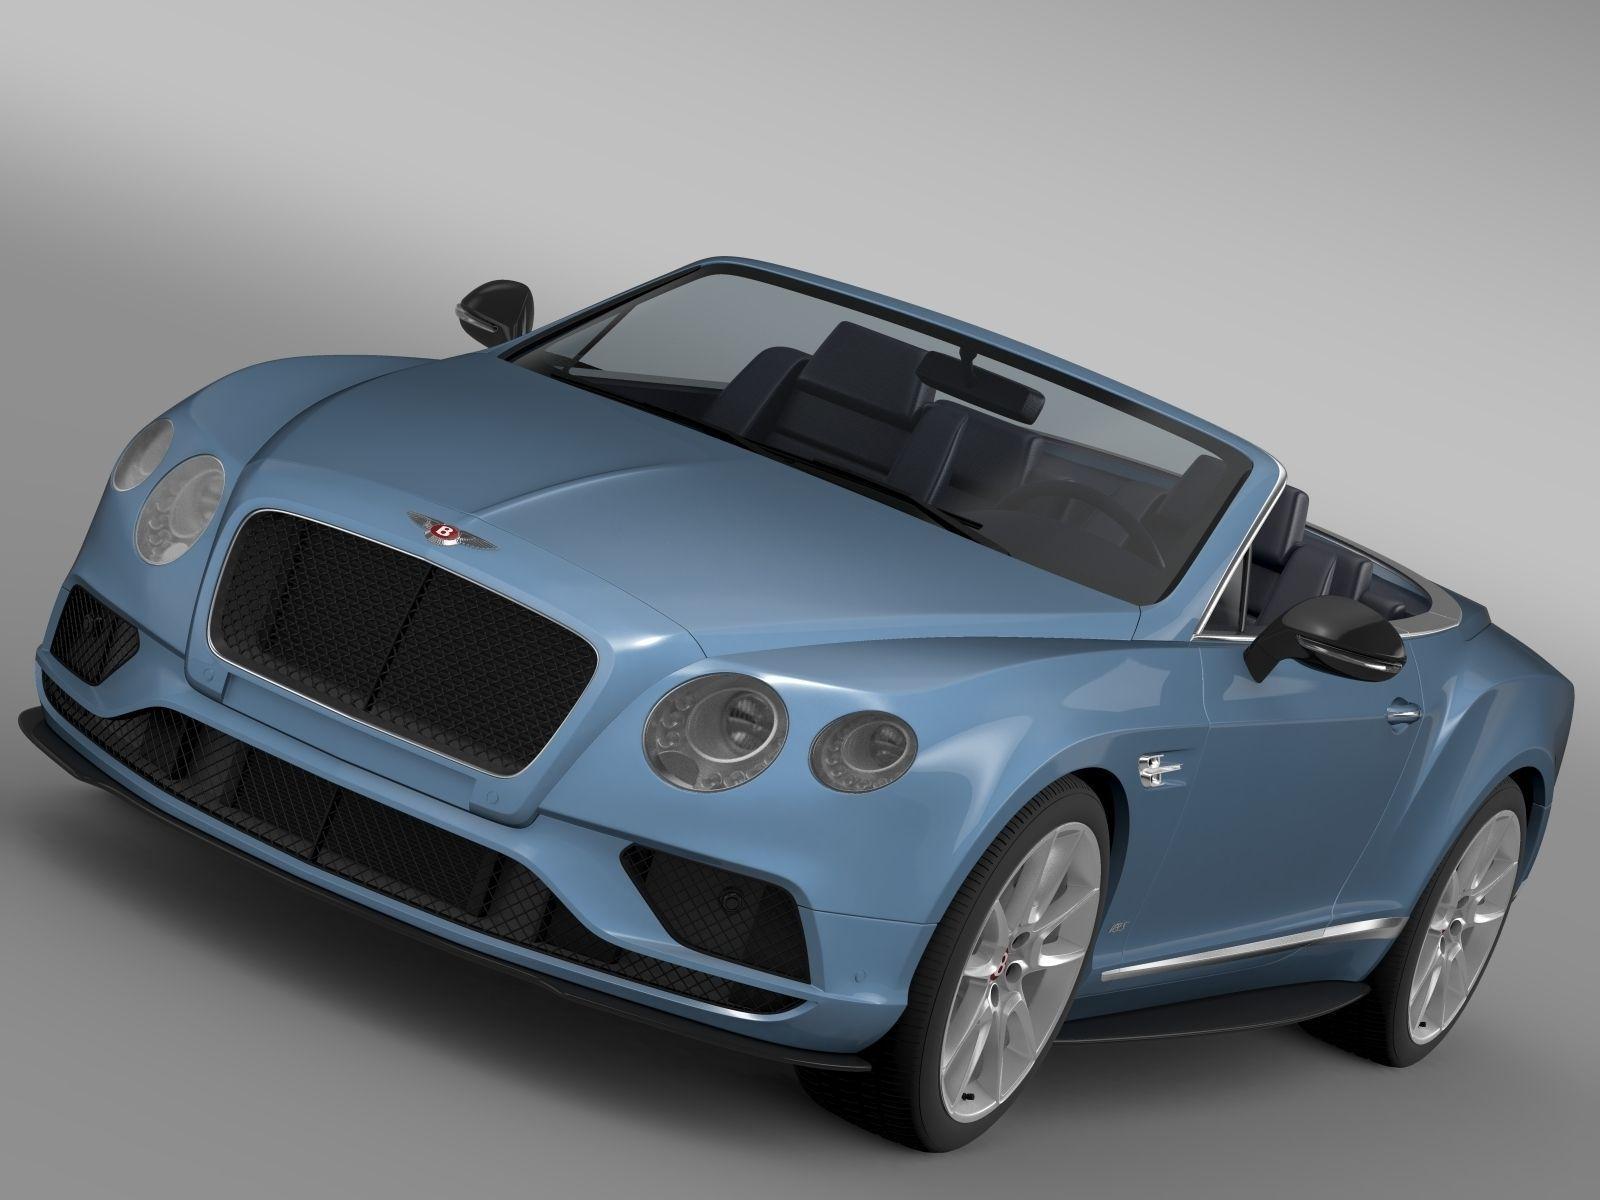 Bentley Continental Gt V8 S Convertible 2017 Model